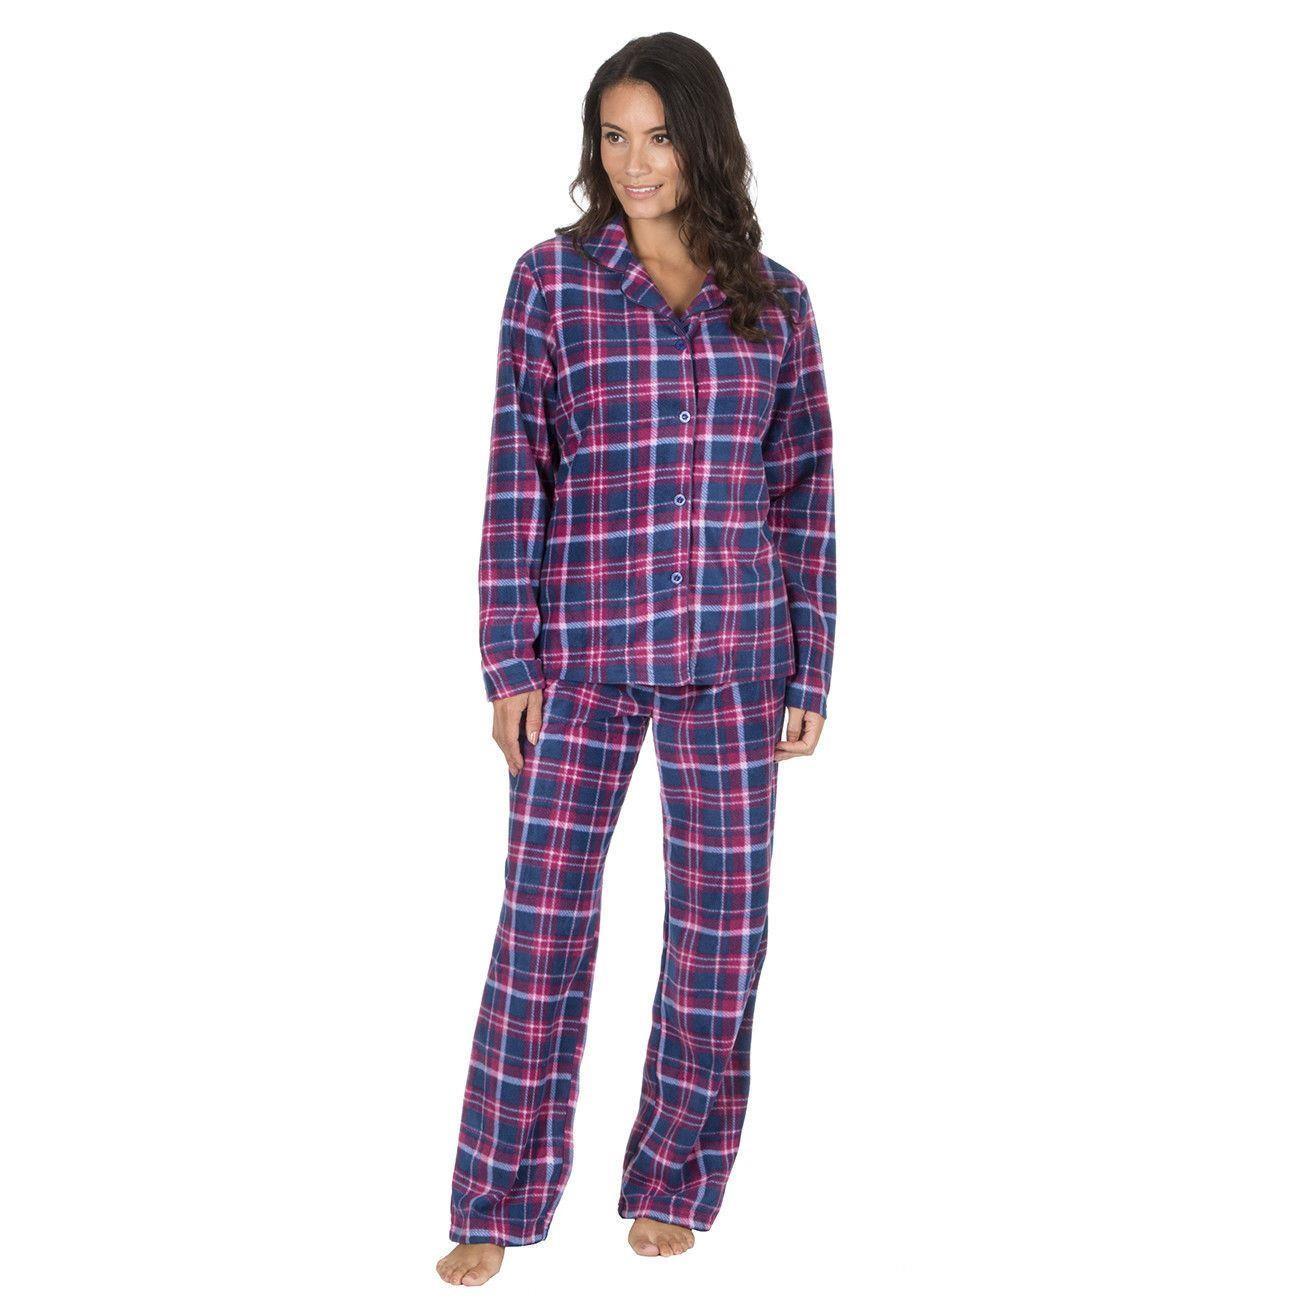 Forever Dreaming Fleece Check Pyjama Set - Navy  13105a165